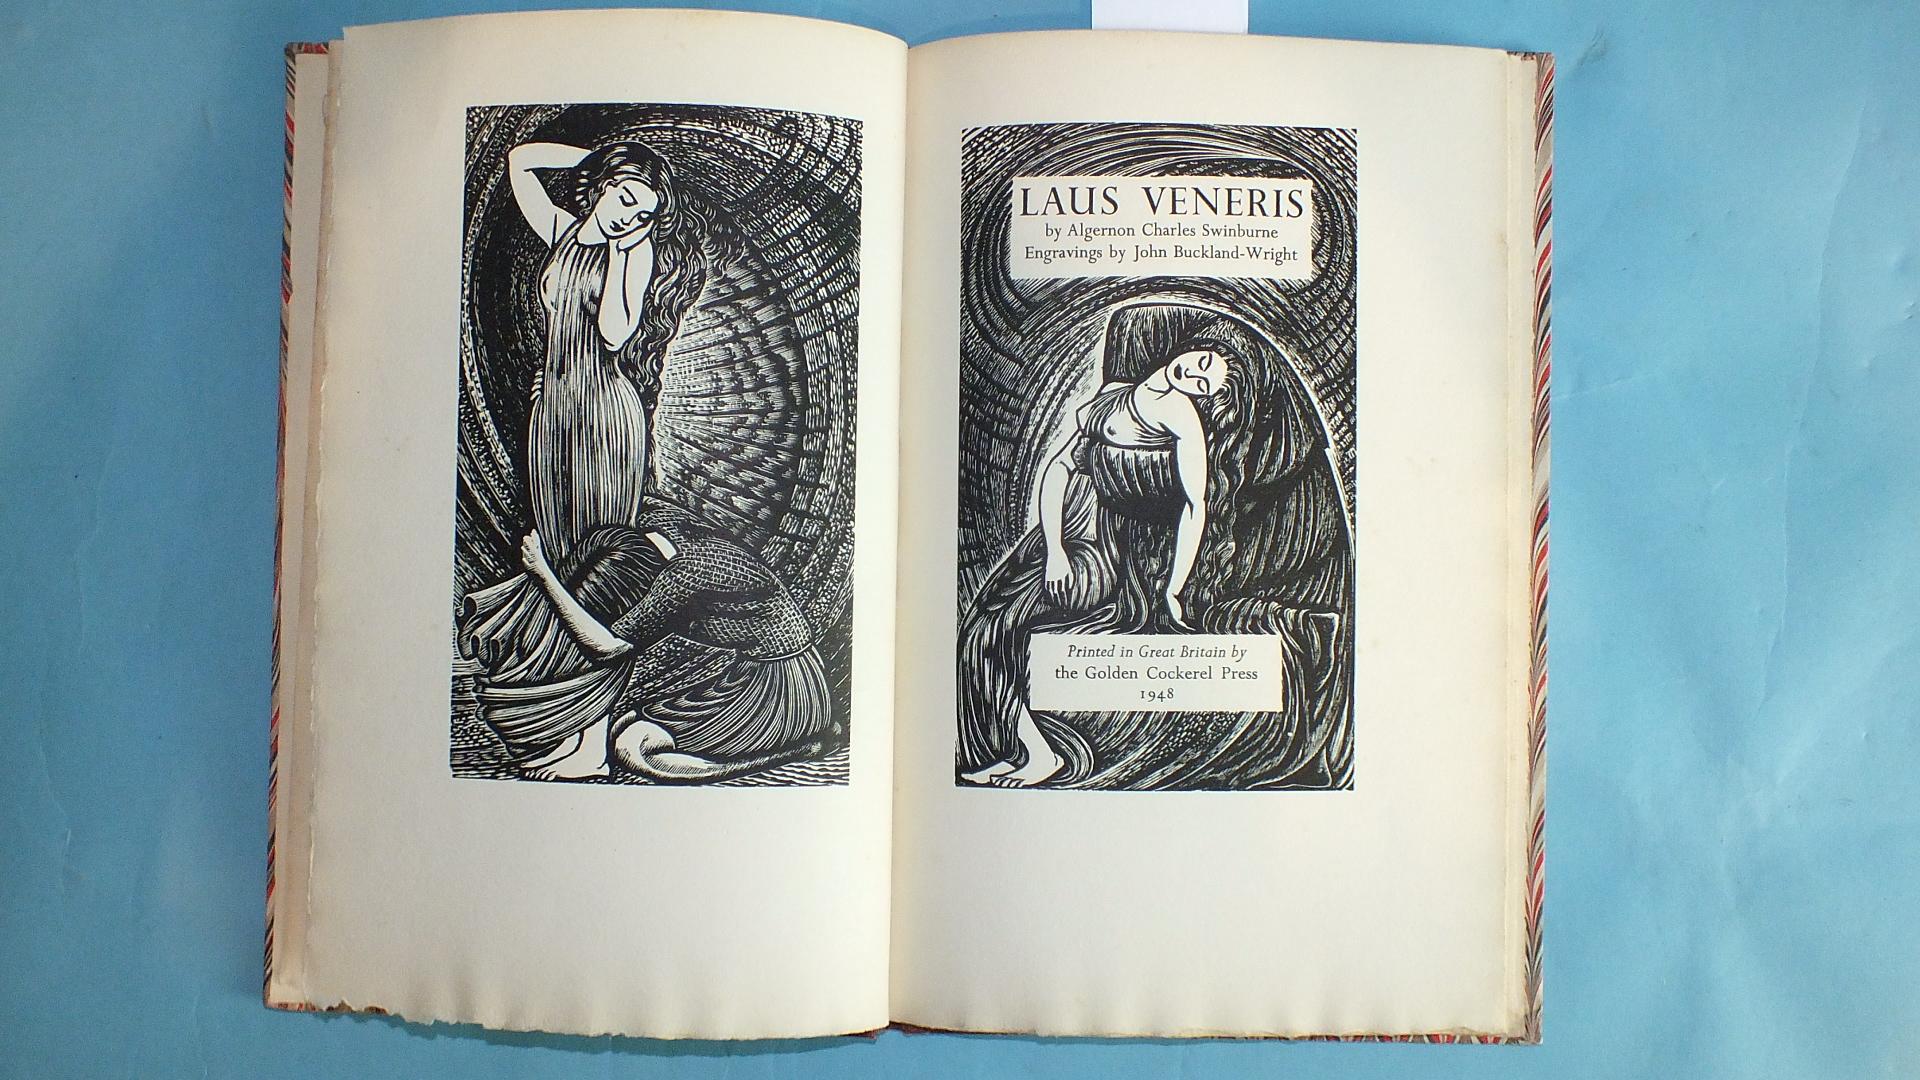 Lot 27 - Golden Cockerel Press, Swinburne (Algernon Charles), Laus Veneris, wood engr tp and illus by John